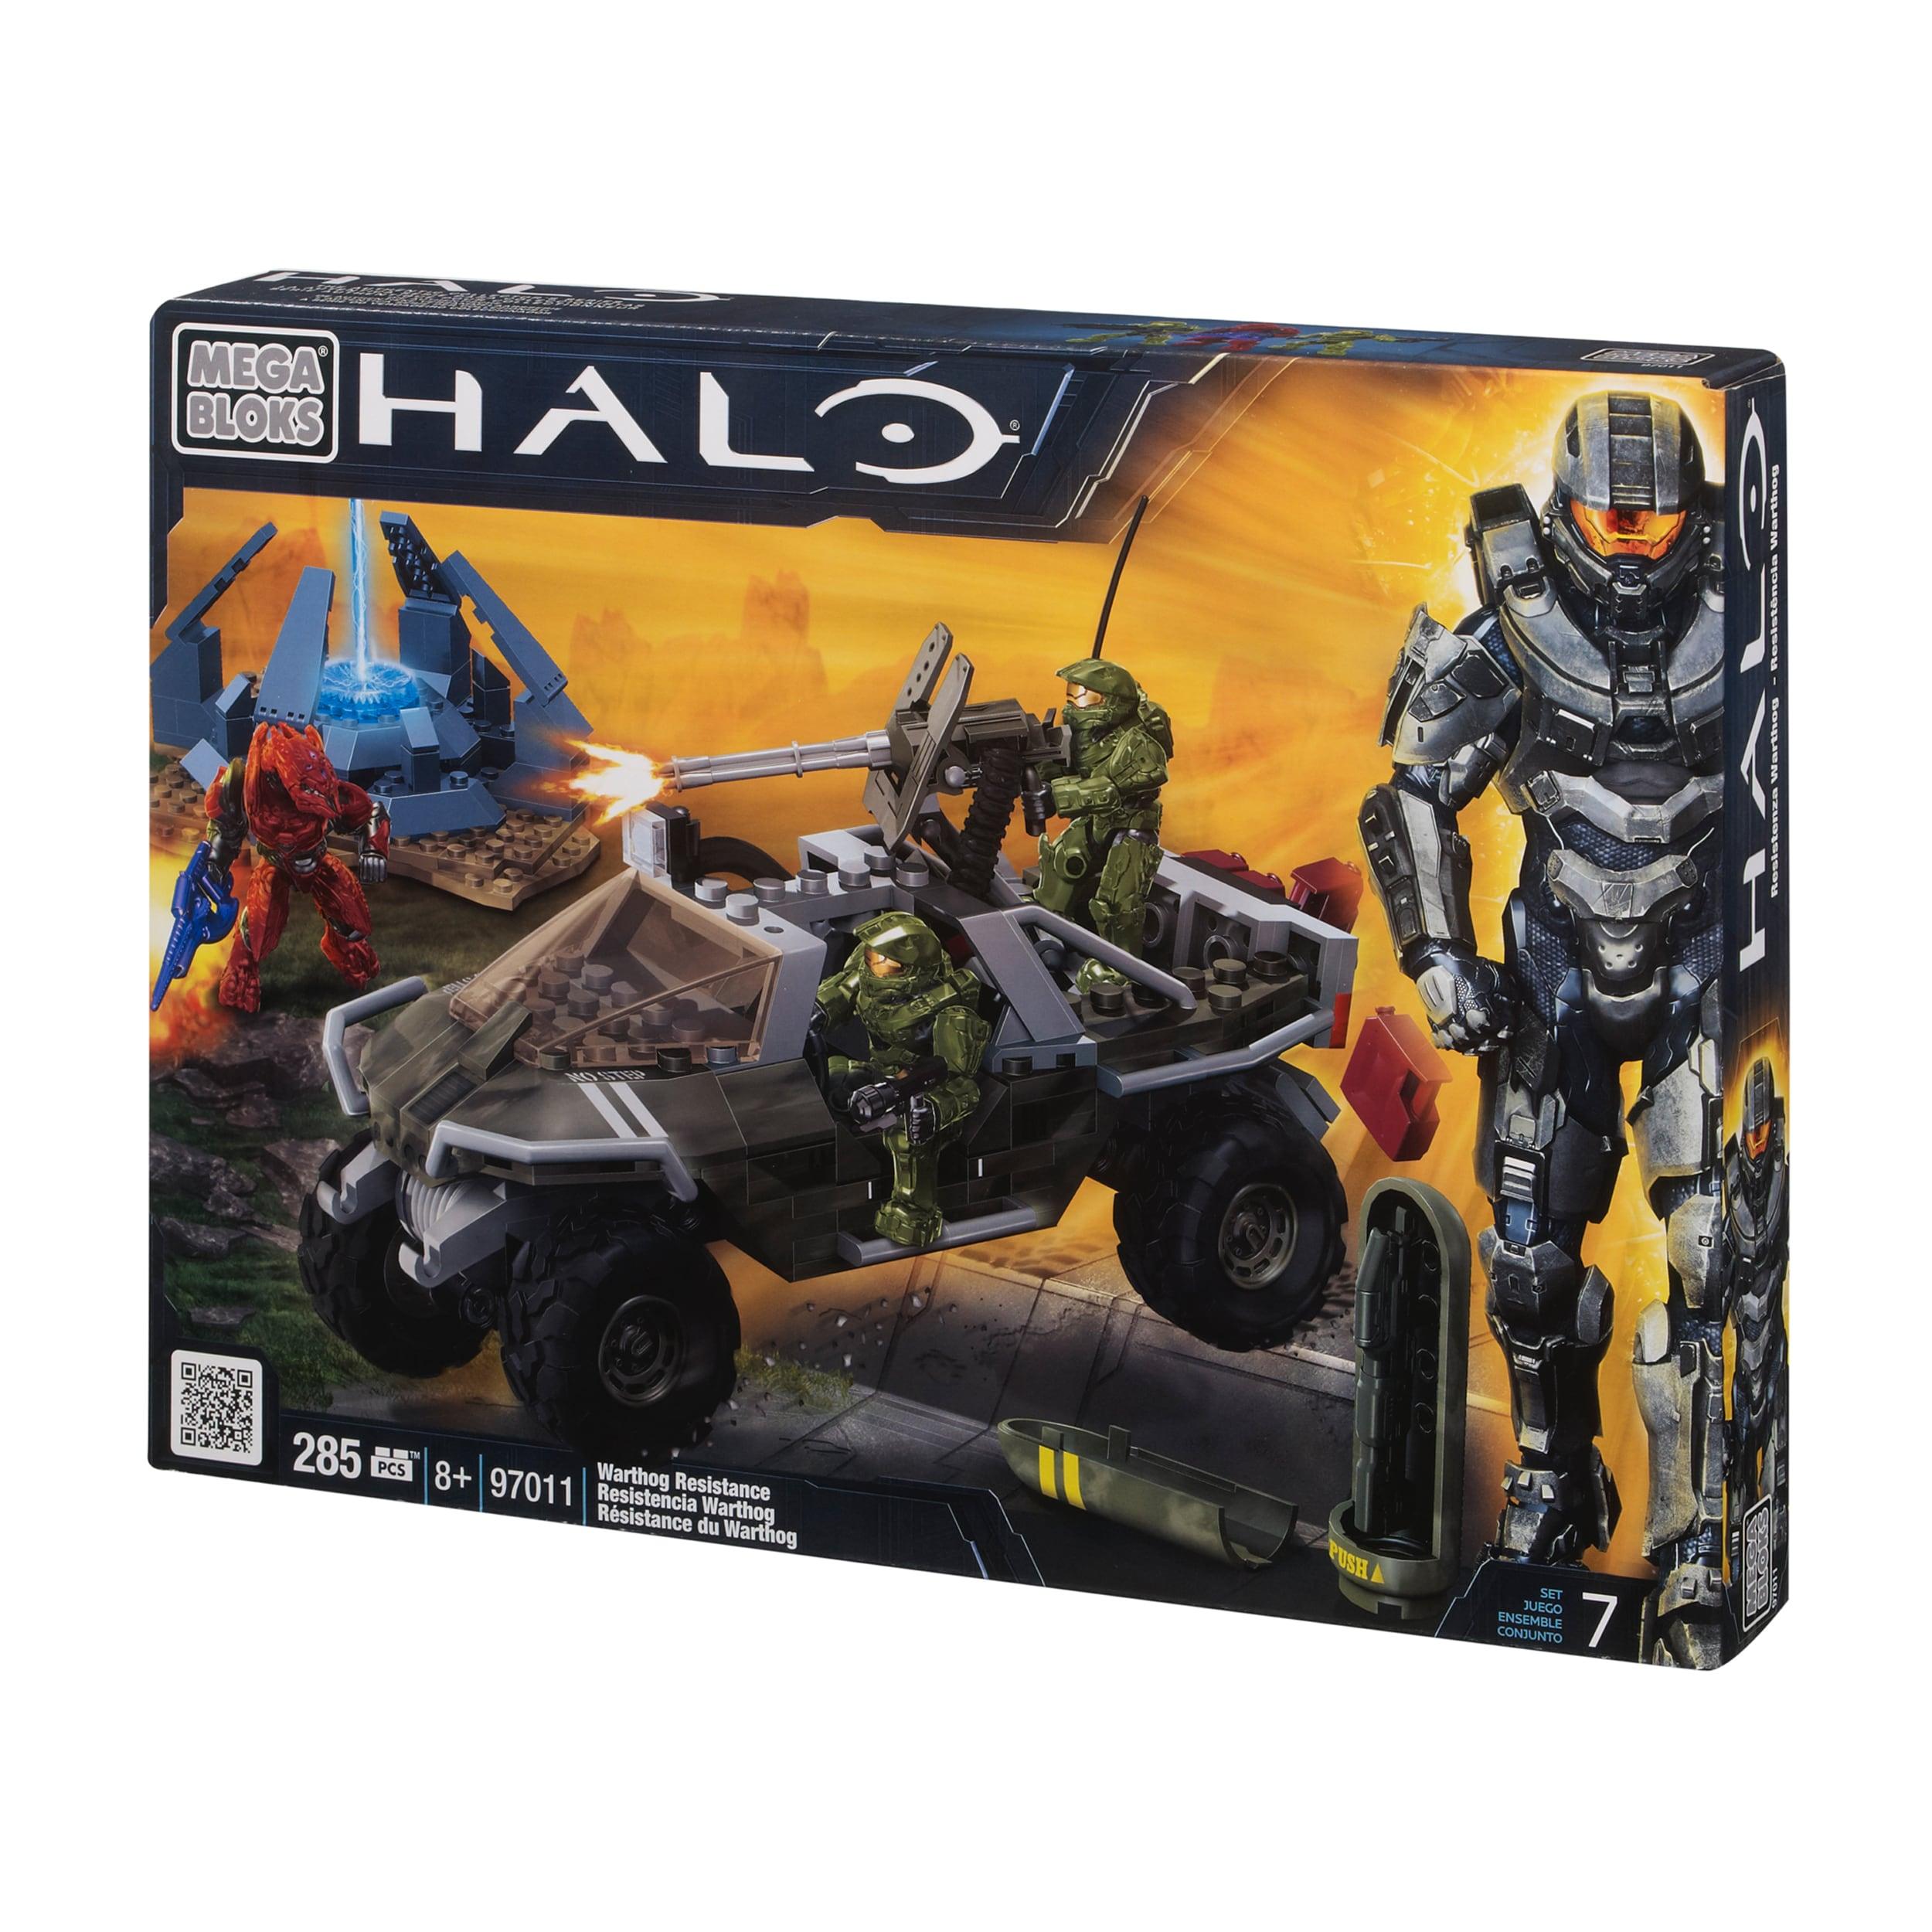 Mega Bloks Halo Warthog Resistance Playset